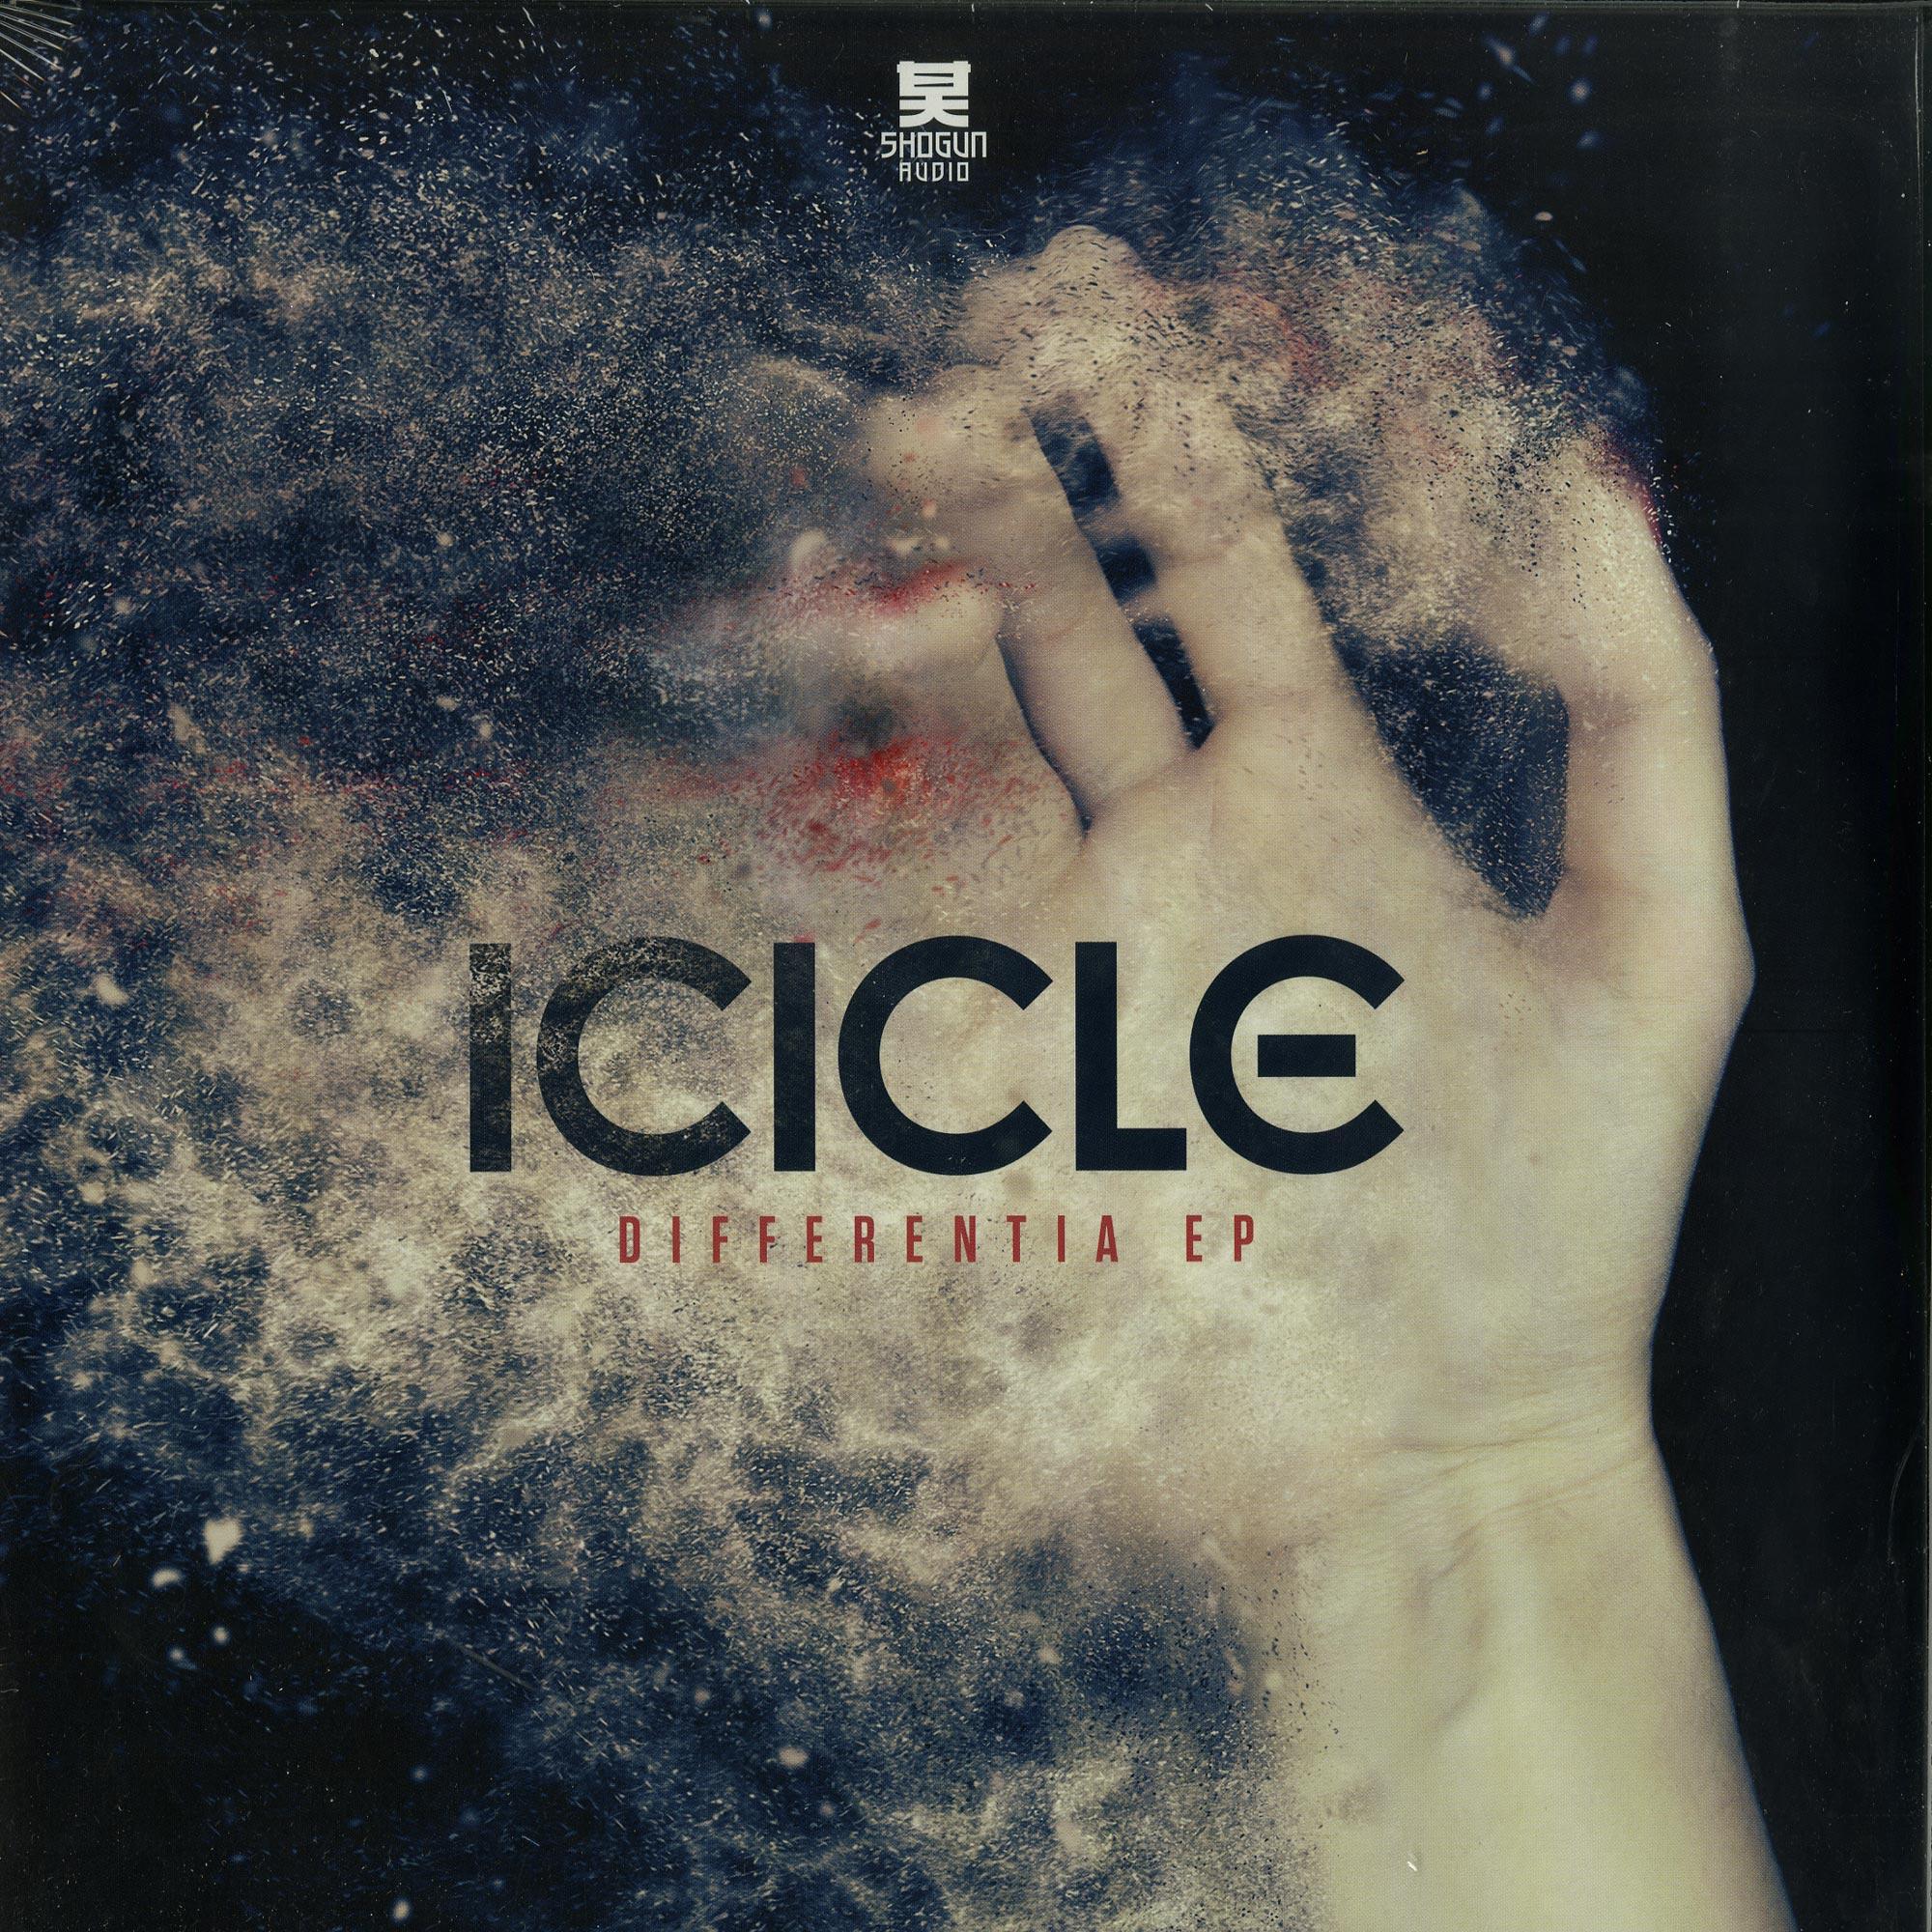 Icicle - DIFFERENTIA EP